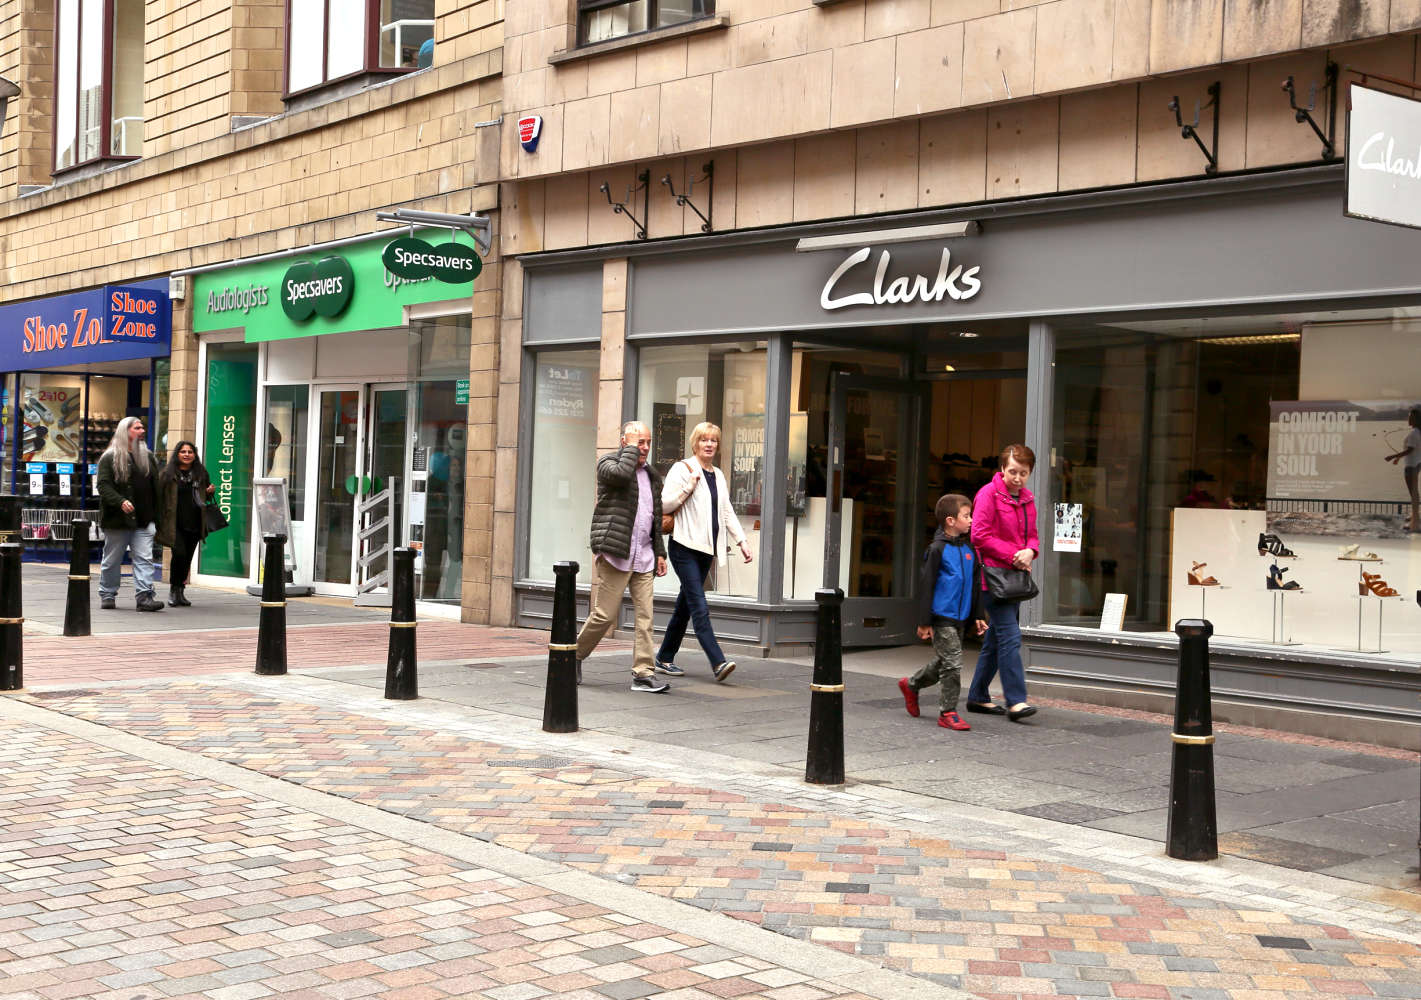 Retail high street Inverness, IV1 1JE - 40-42, High Street - 0027